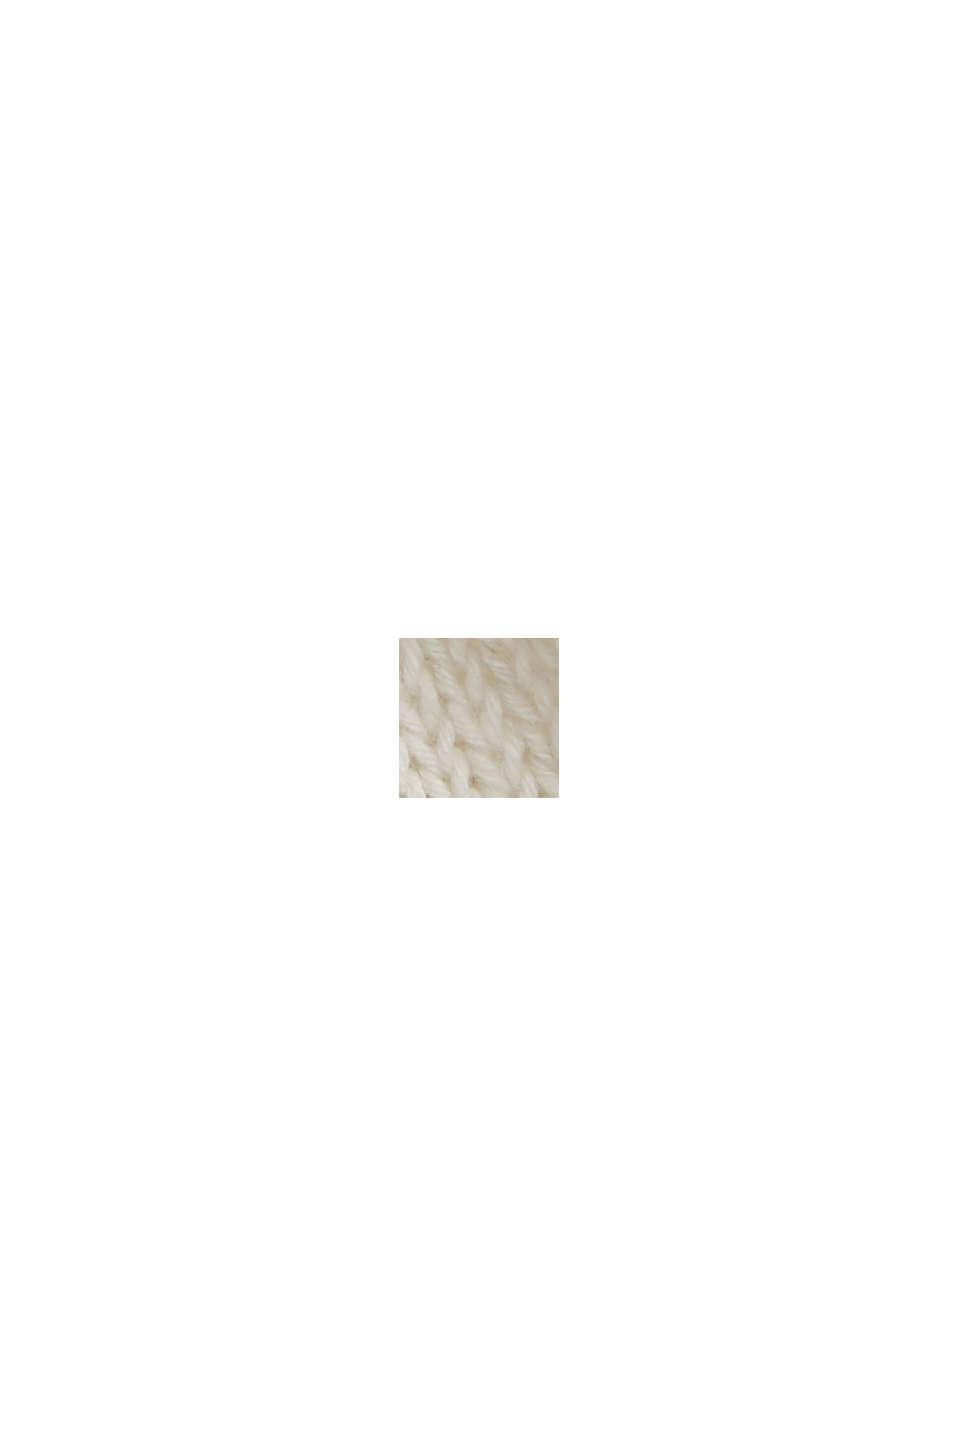 #ReimagineNaturalLifestyle: trui van een linnenmix, OFF WHITE, swatch